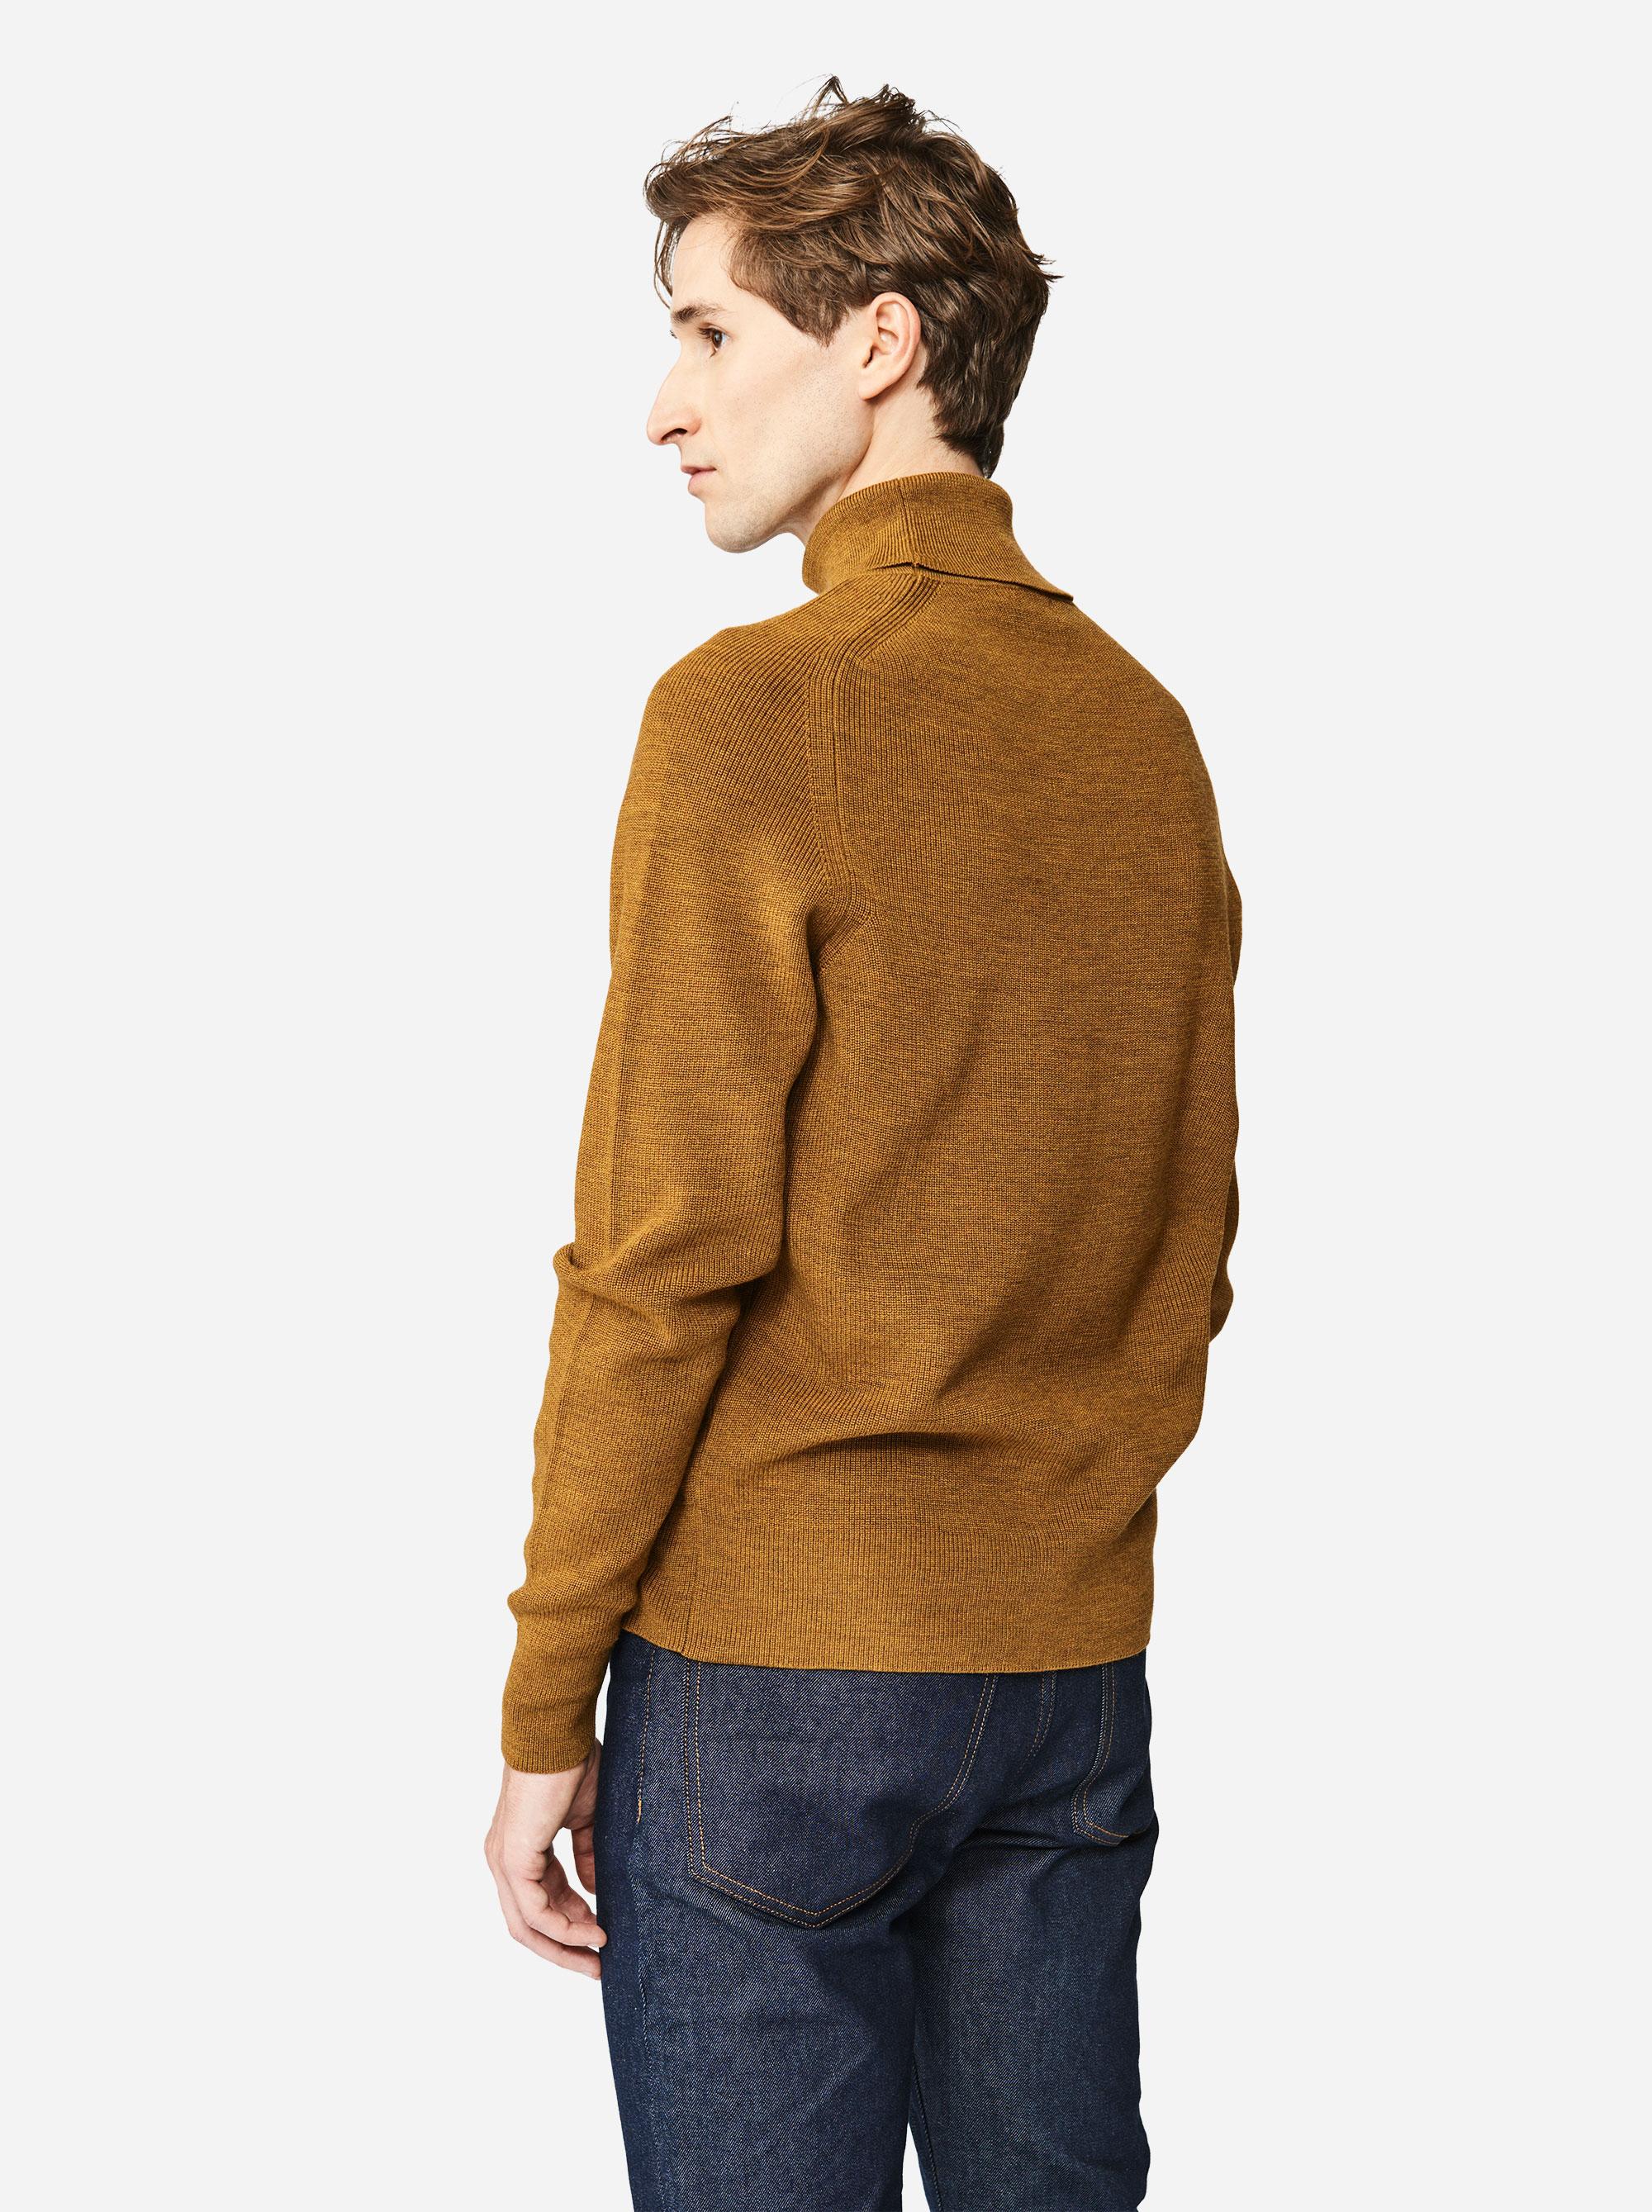 Teym - Turtleneck - The Merino Sweater - Men - Mustard - 2